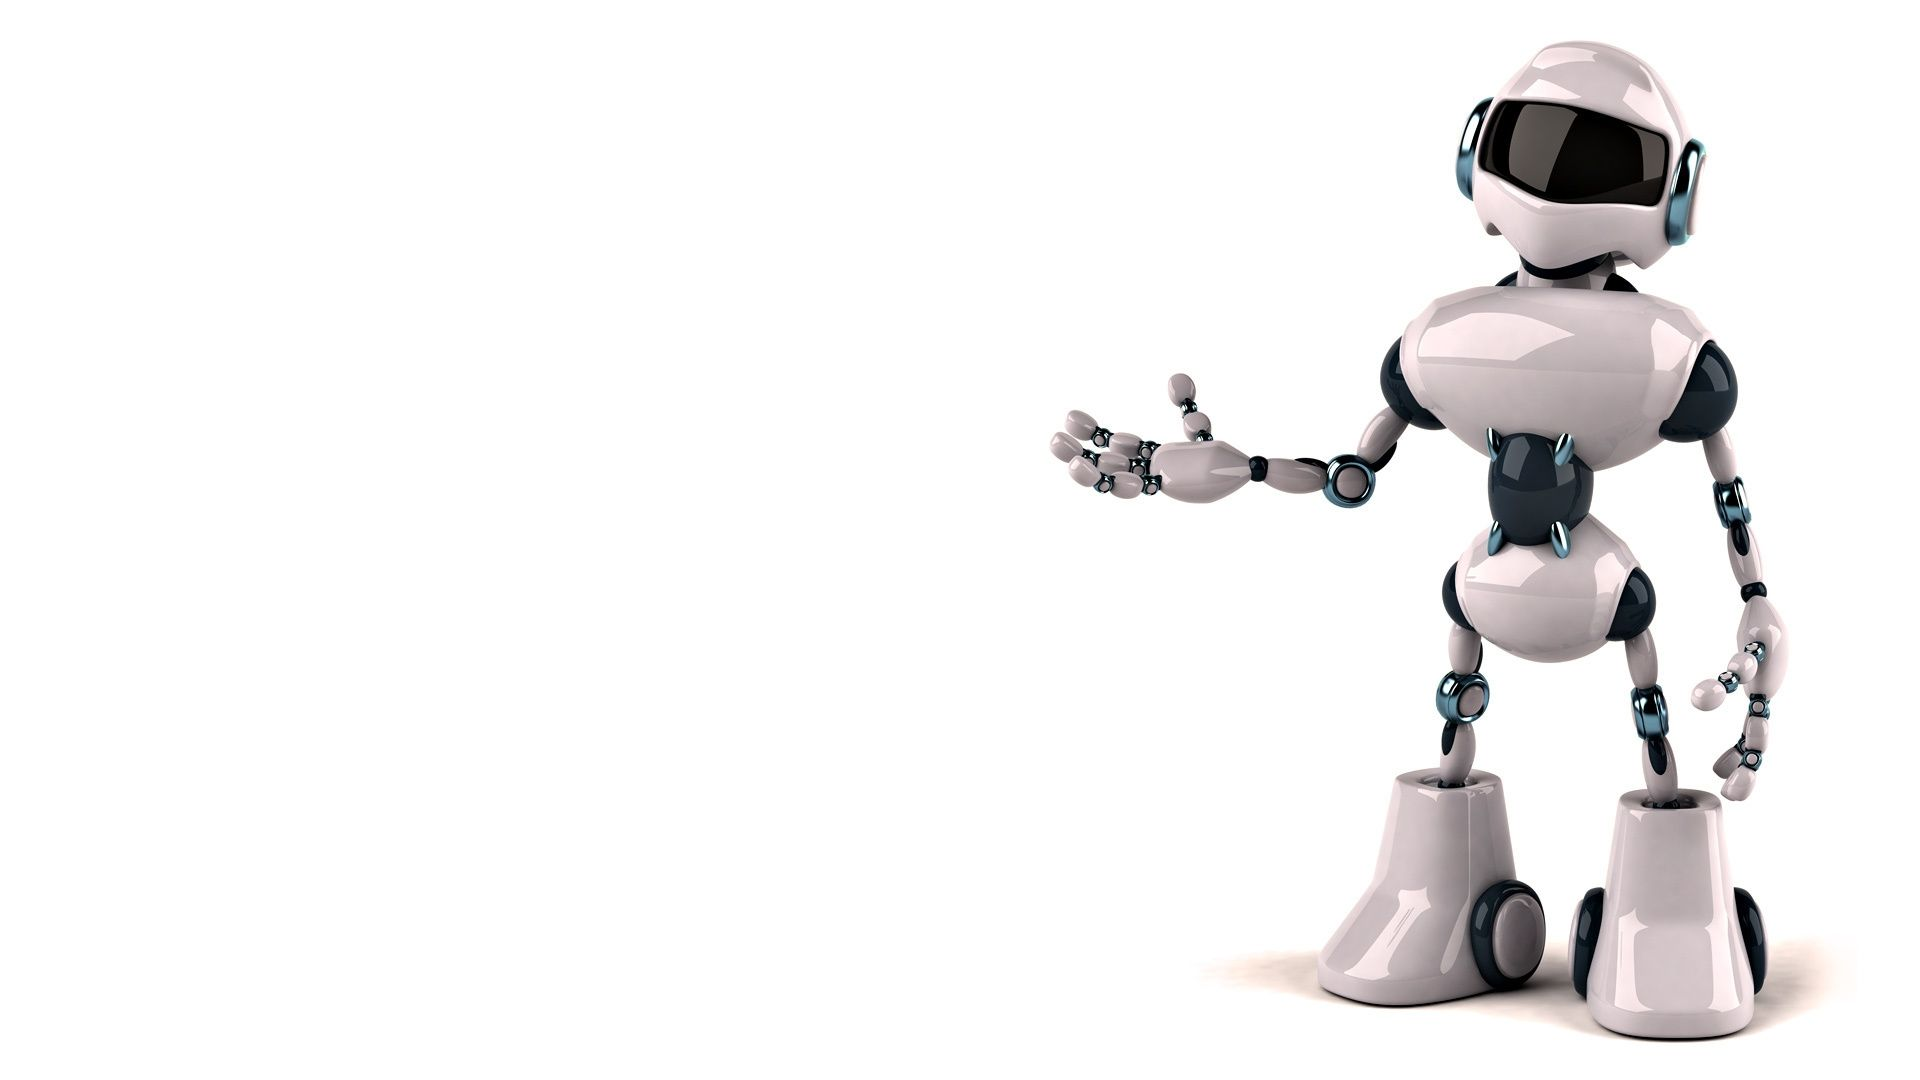 Page K Ultra Hd Robot Wallpapers Hd Desktop Backgrounds Robot Wallpaper Hi Tech Wallpaper Robot Background